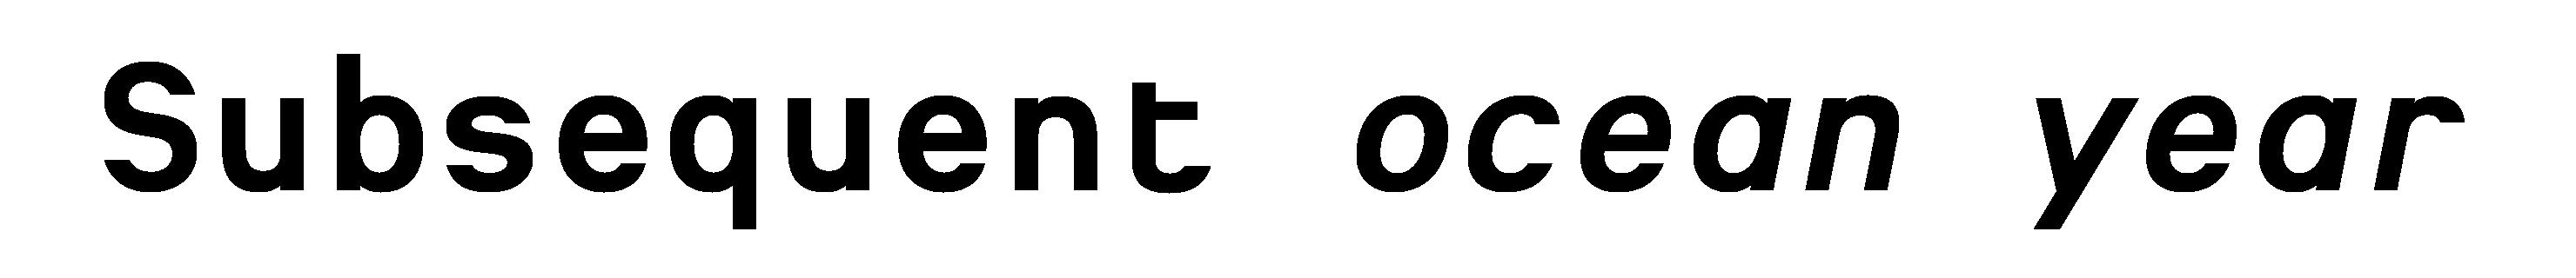 Typeface Heimat Mono D011 Atlas Font Foundry